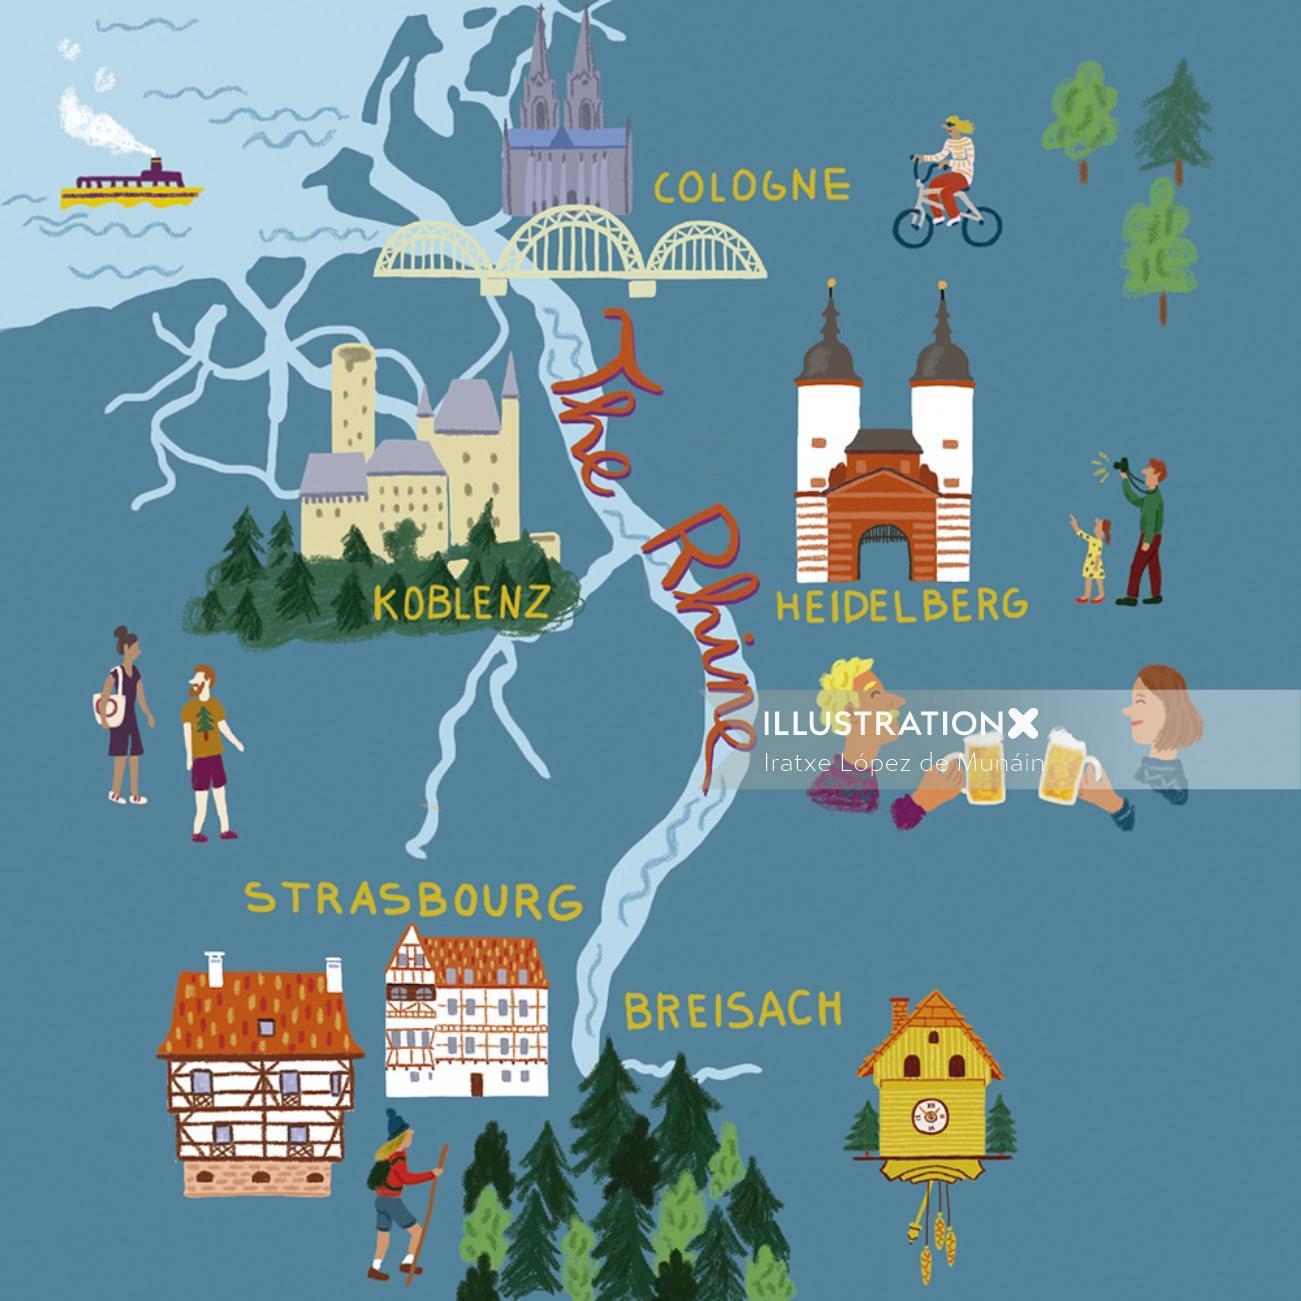 The Rhine River map artwork